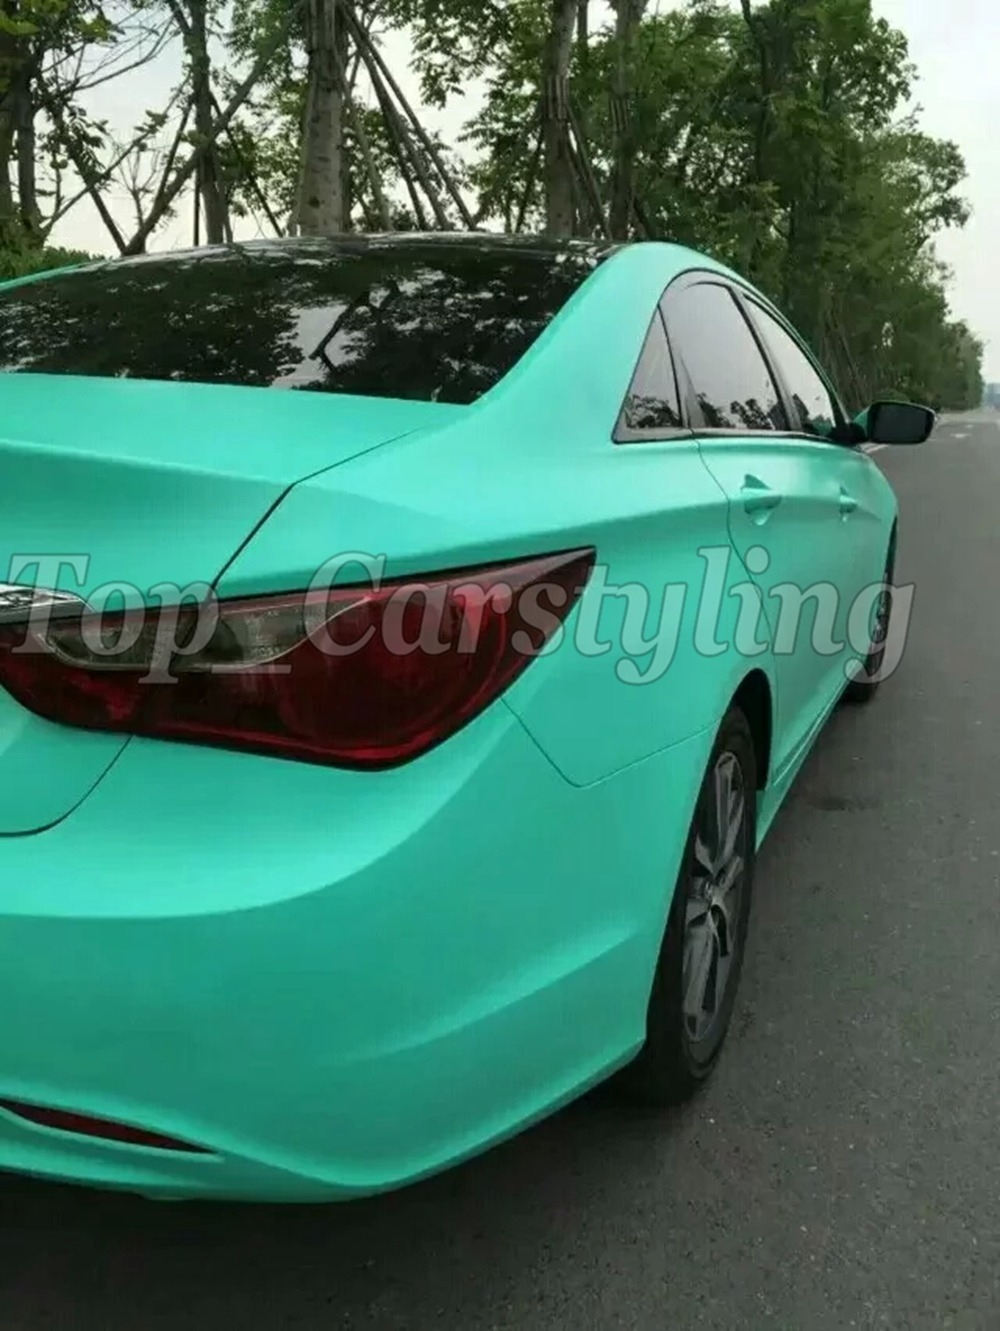 Matte tiffany blue mint green vinyl car wrapping film 3m satin white car wrap Film Foile (7)